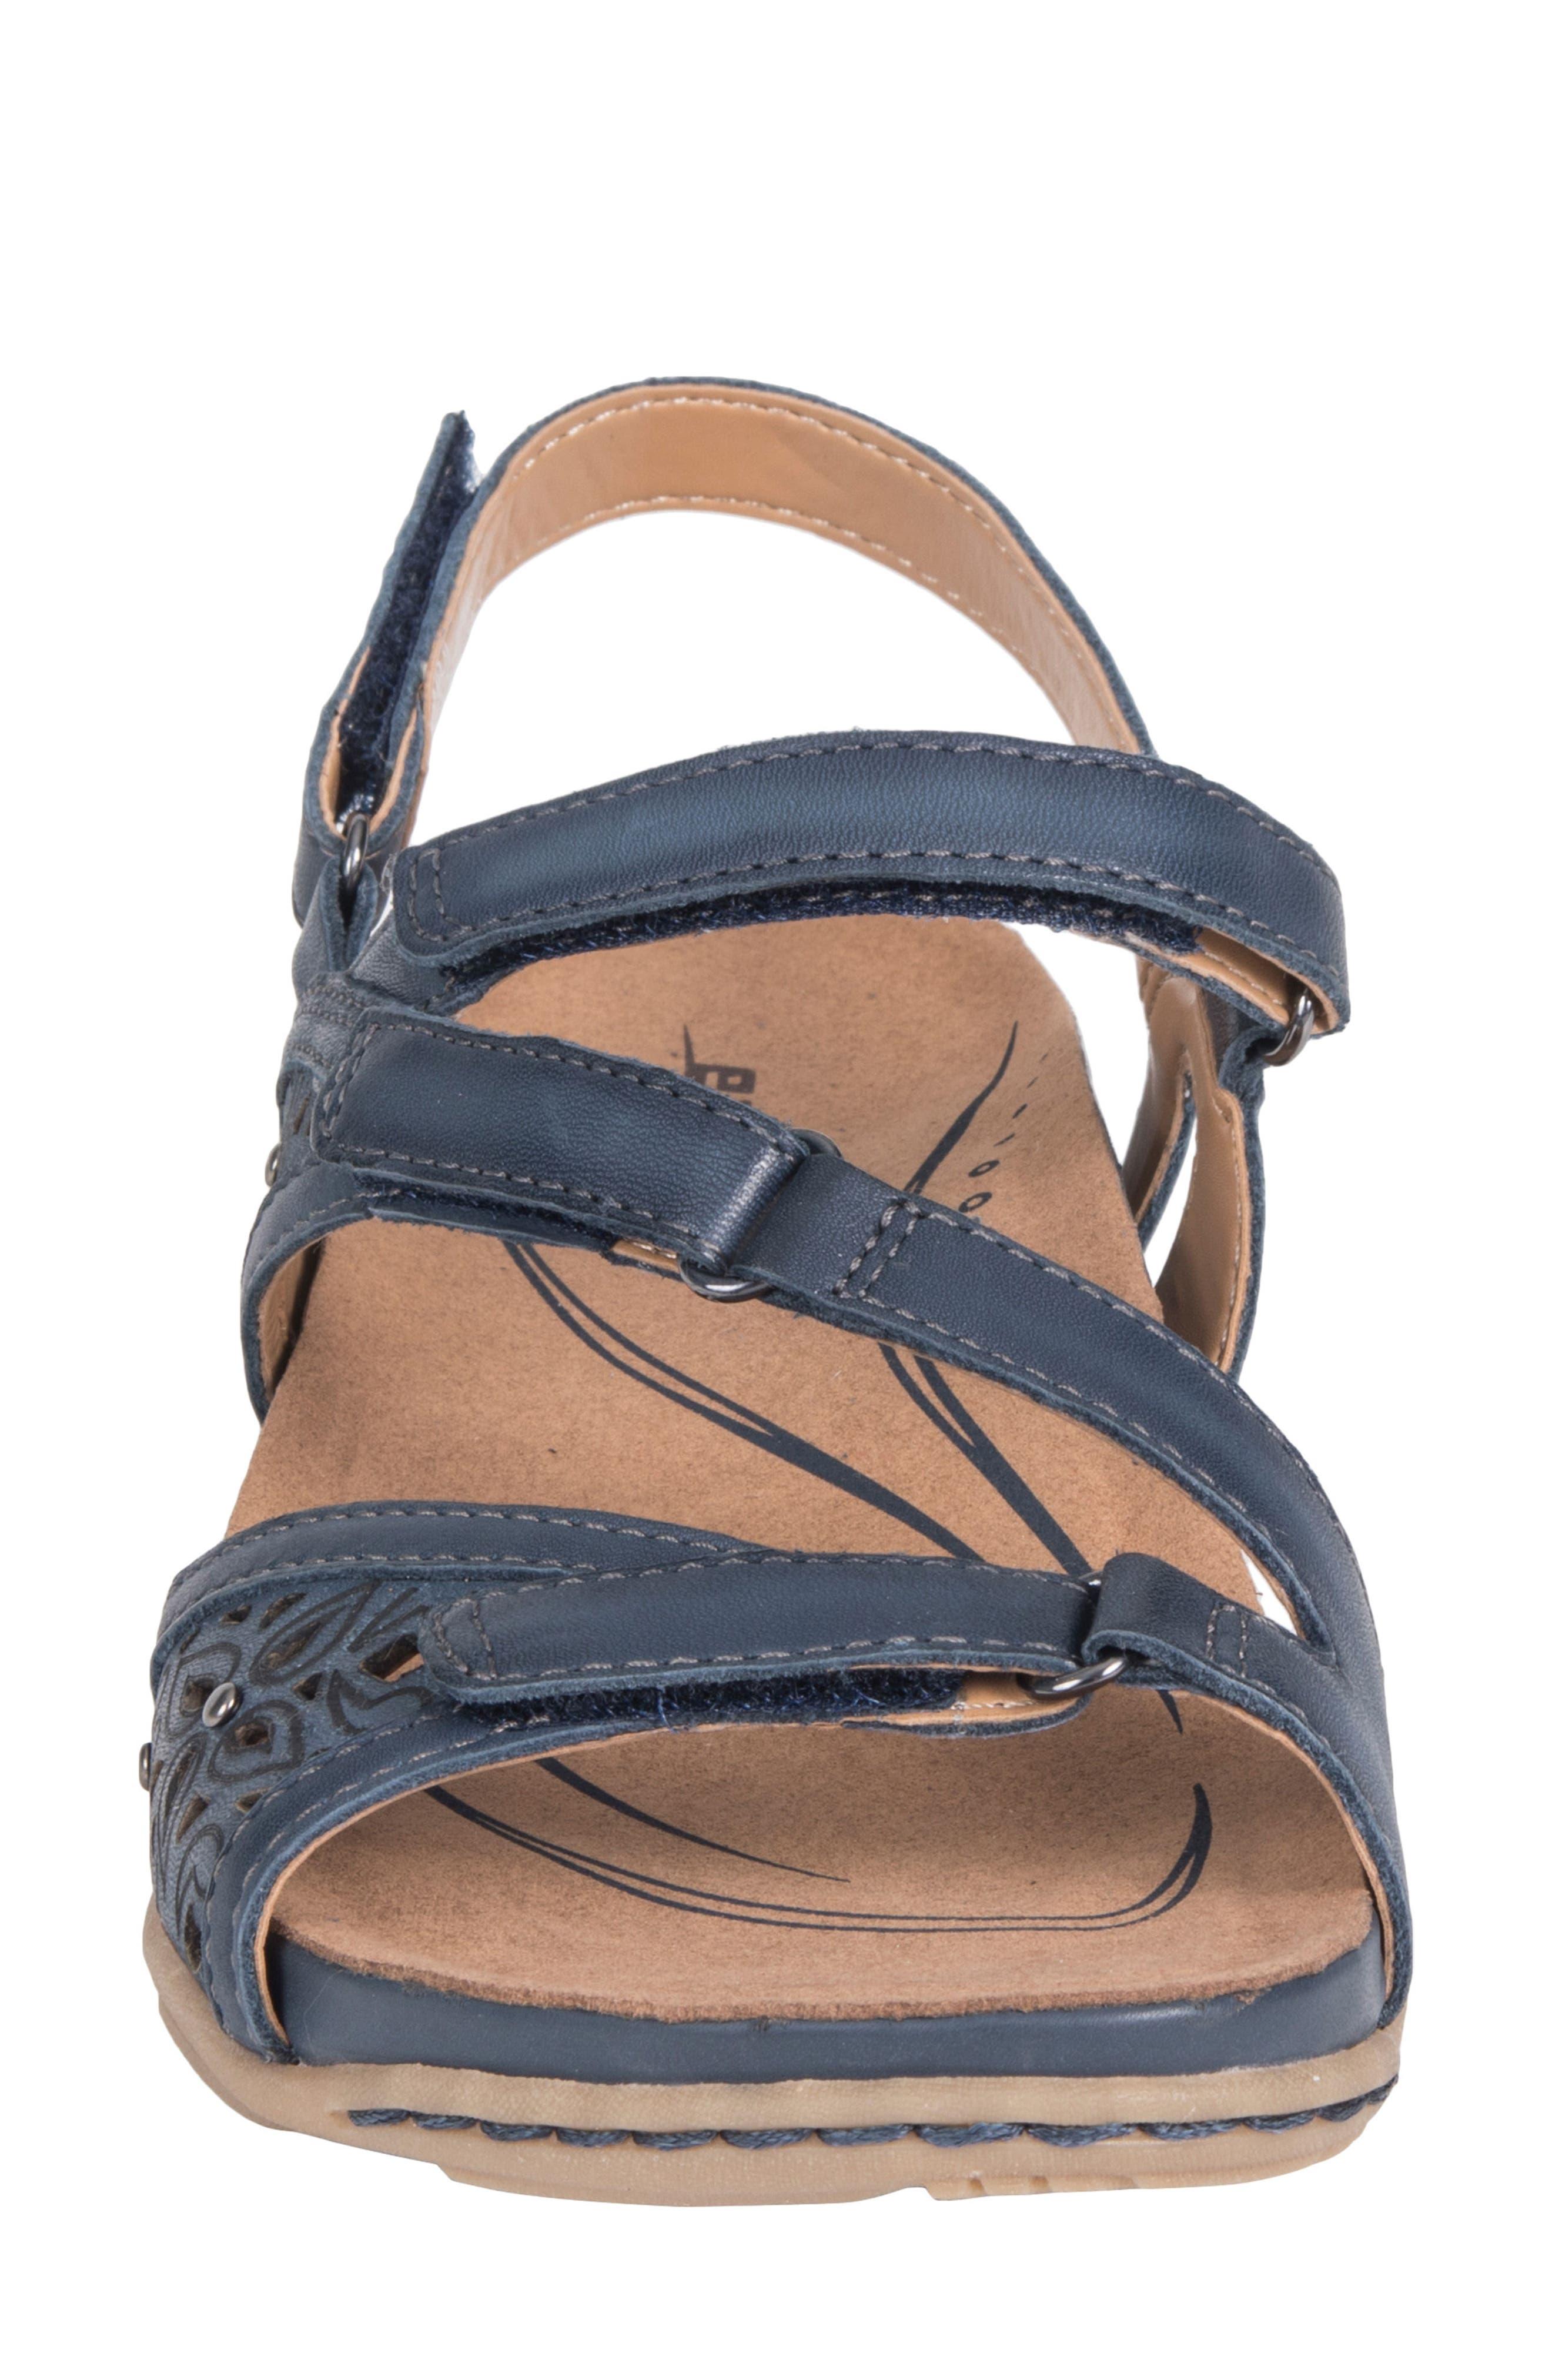 Maui Strappy Sandal,                             Alternate thumbnail 4, color,                             INDIGO BLUE LEATHER